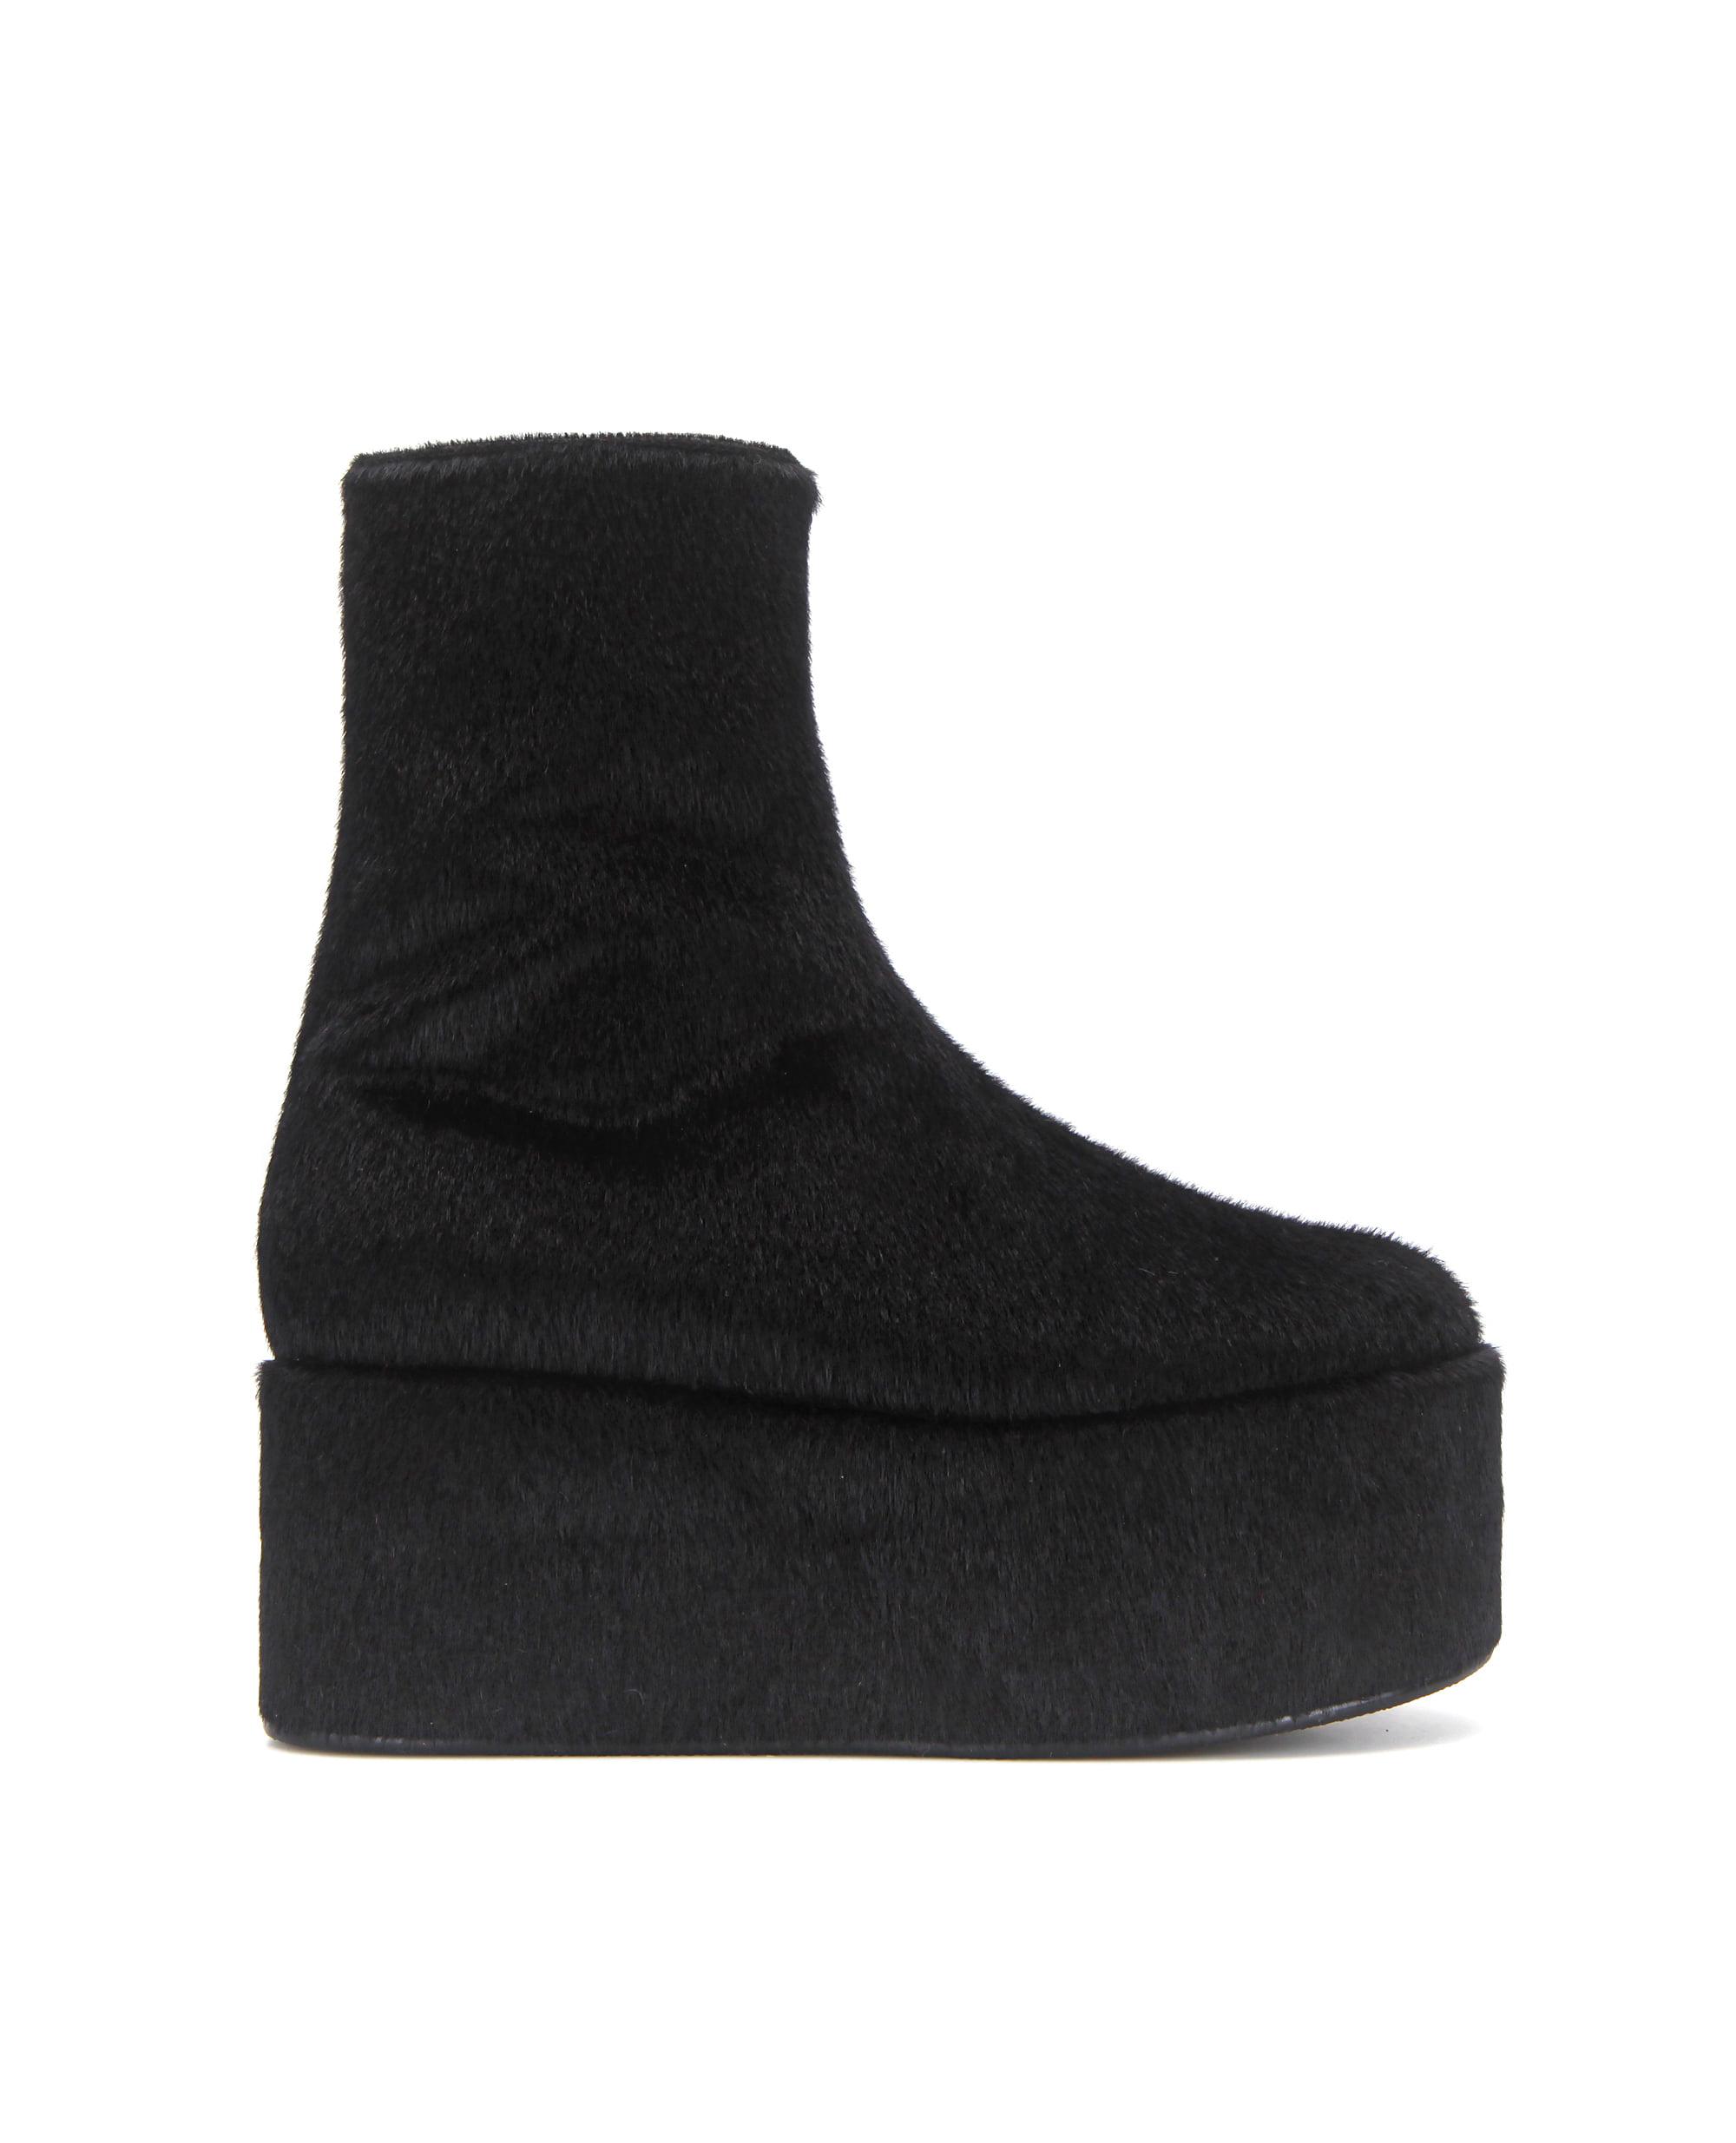 Pebble toe platform boots | Warm black